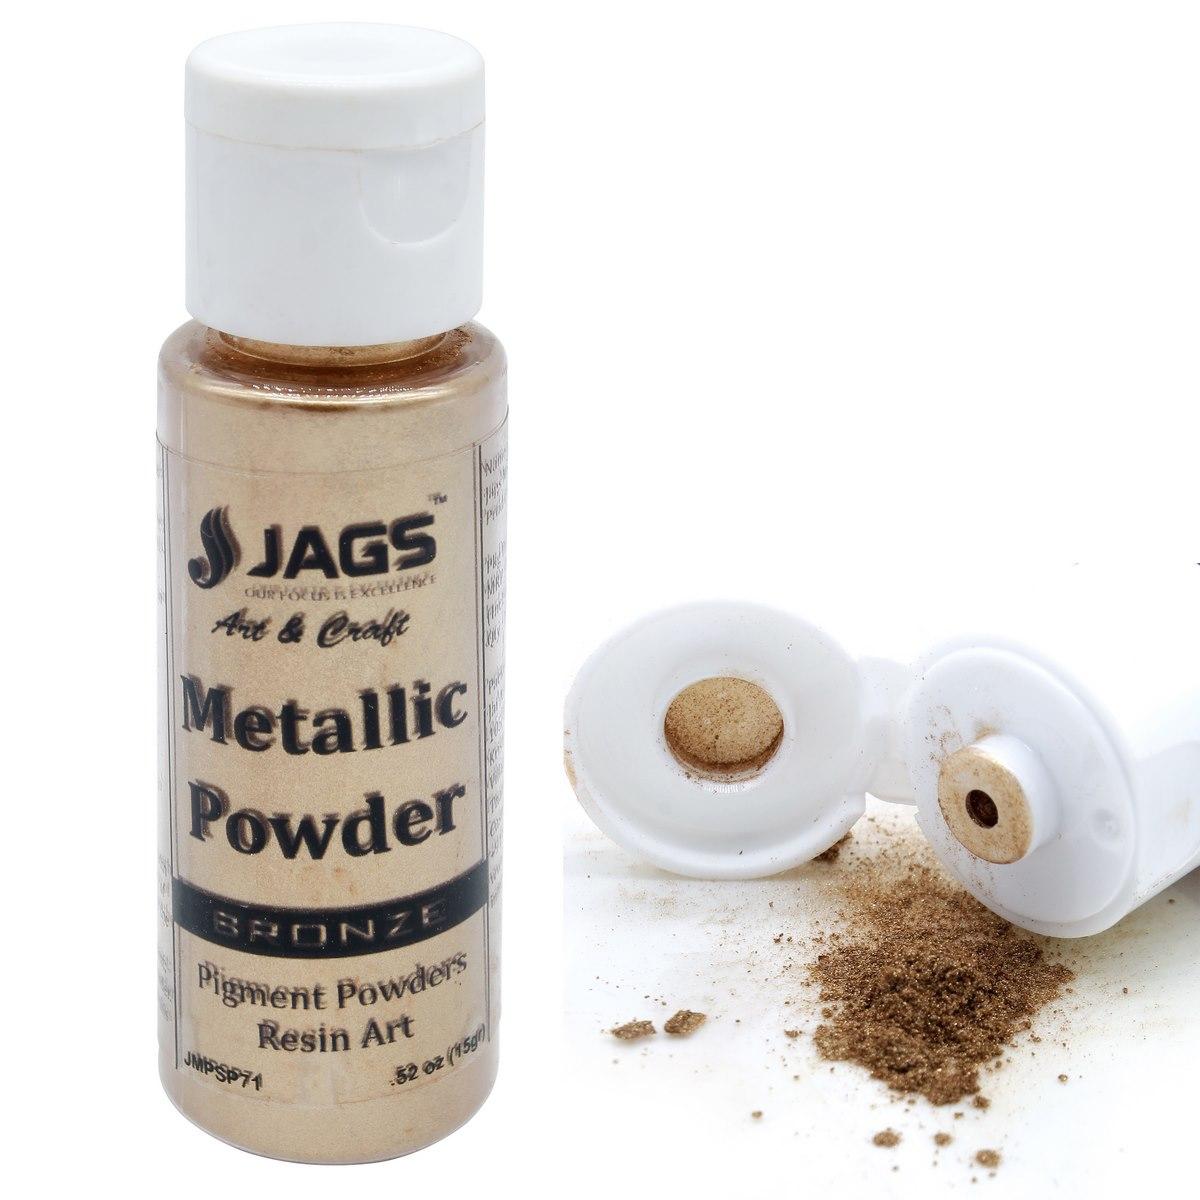 Jags Metallic Powder Bronze 15Gms JMPSP71